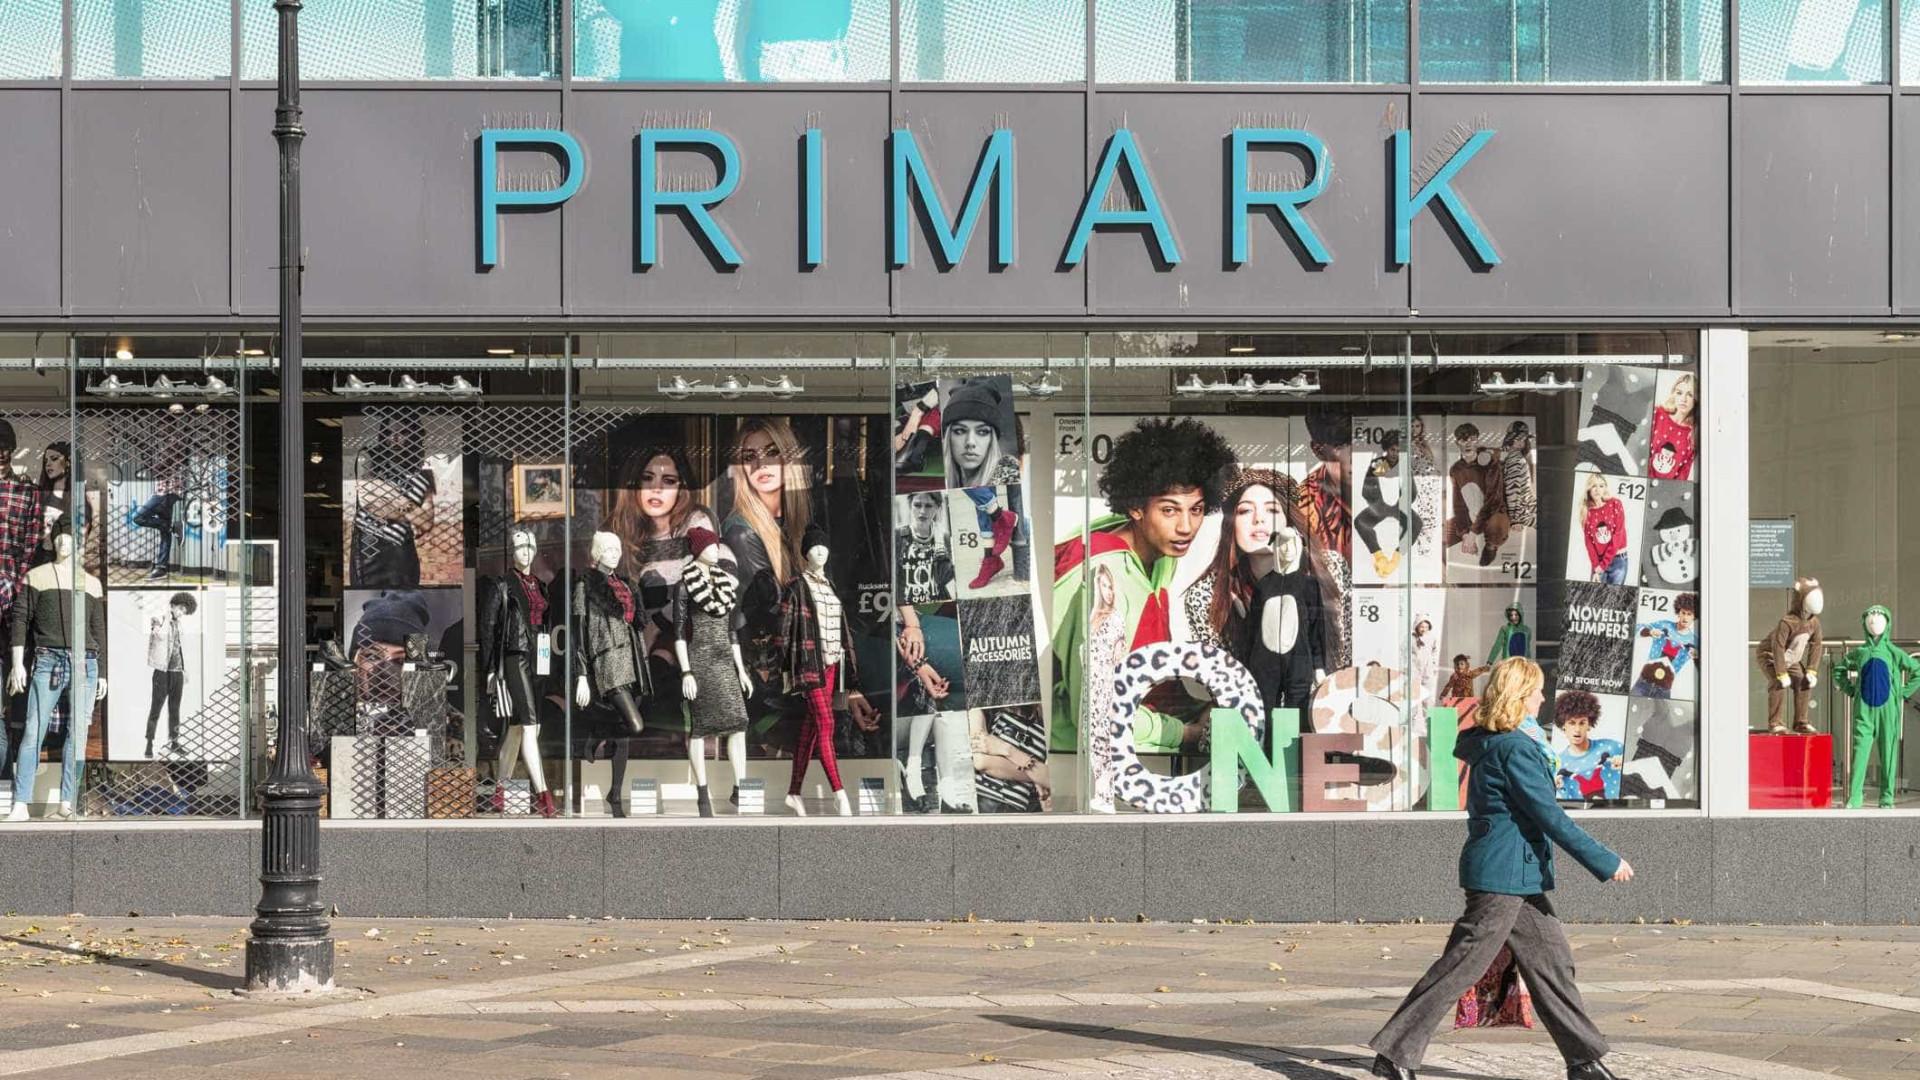 Reino Unido: Primark retira chinelos por causa de químicos perigosos